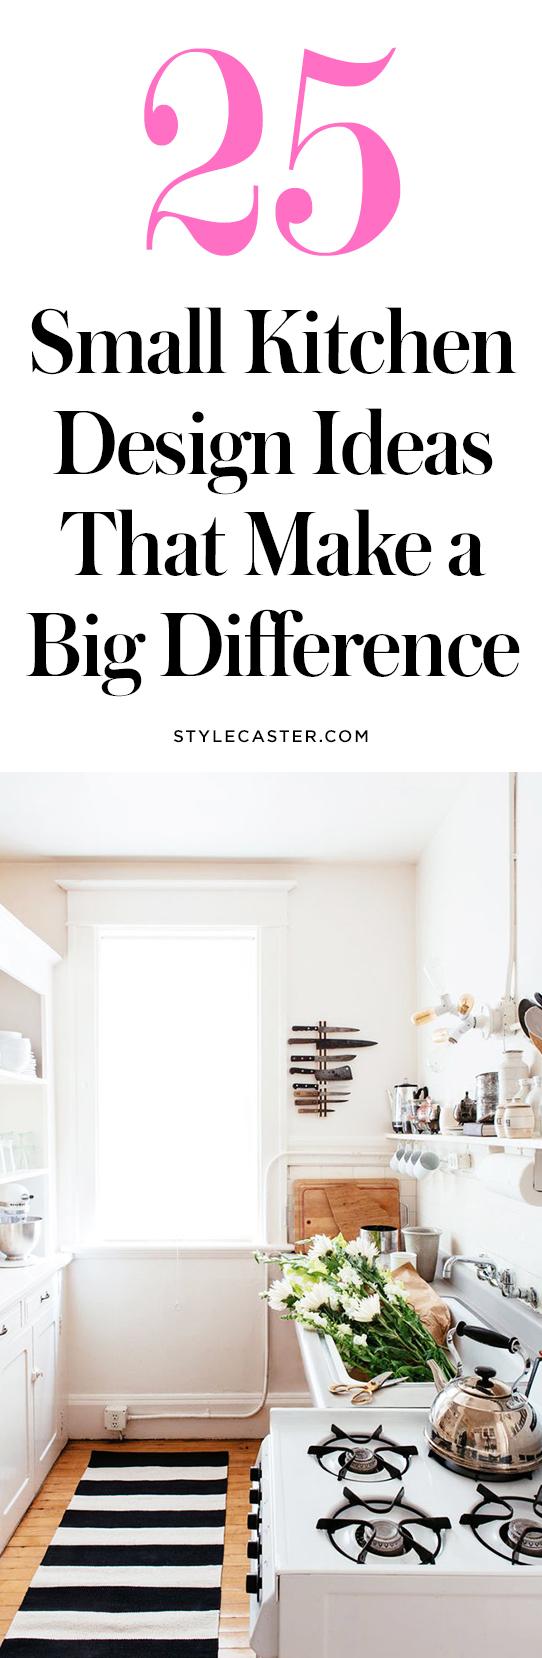 25 small kitchen design ideas | @stylecaster